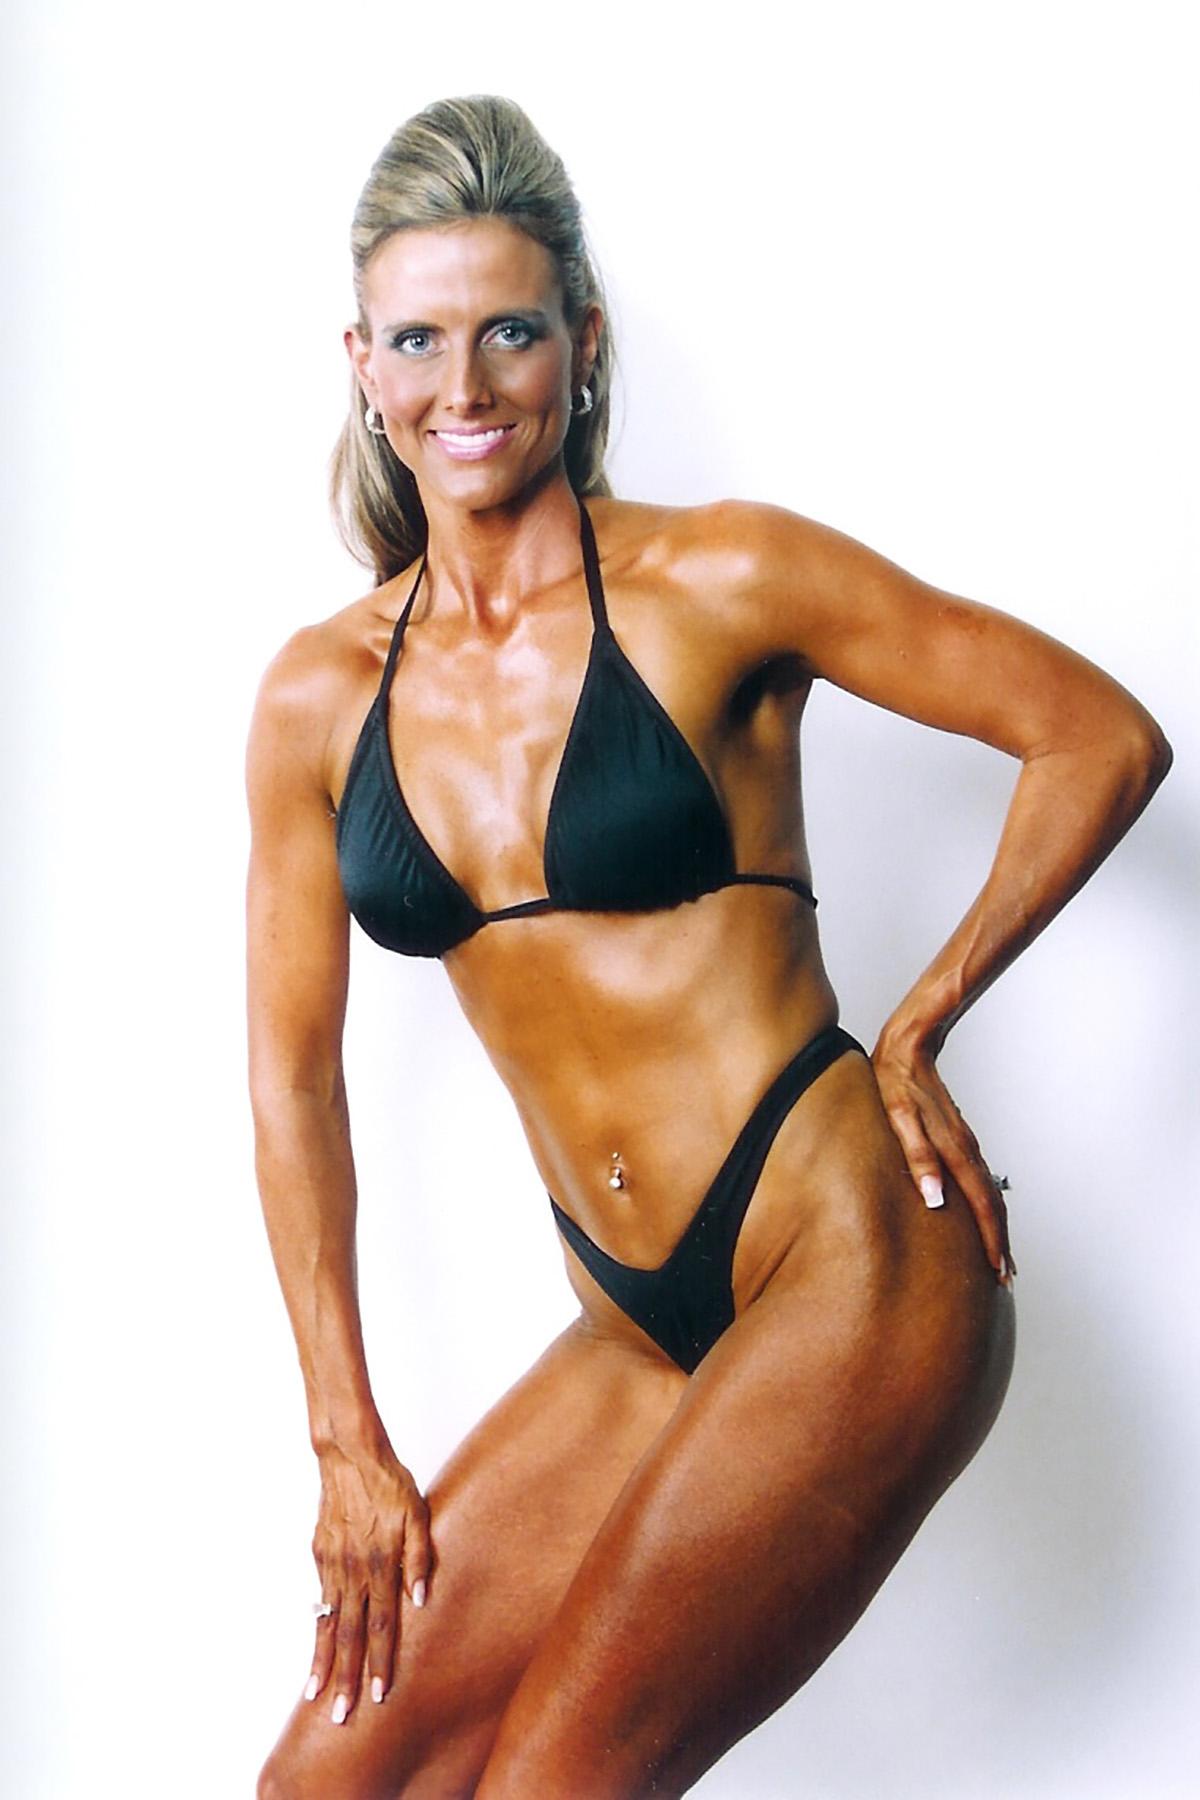 A fitness model posing in a black bikini.